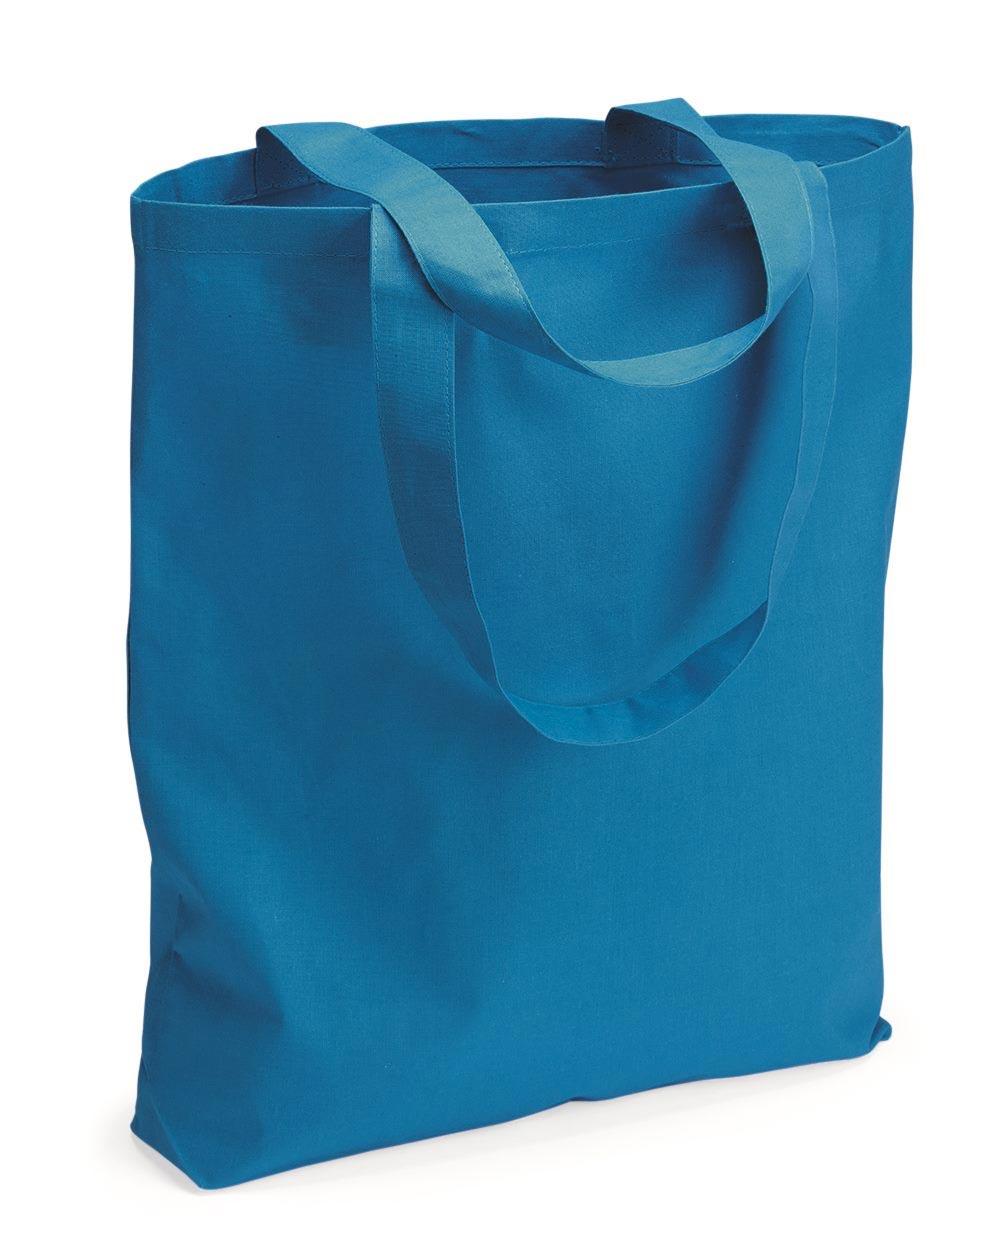 Q-Tees QTBG - 12L Gusseted Economical Tote Bag